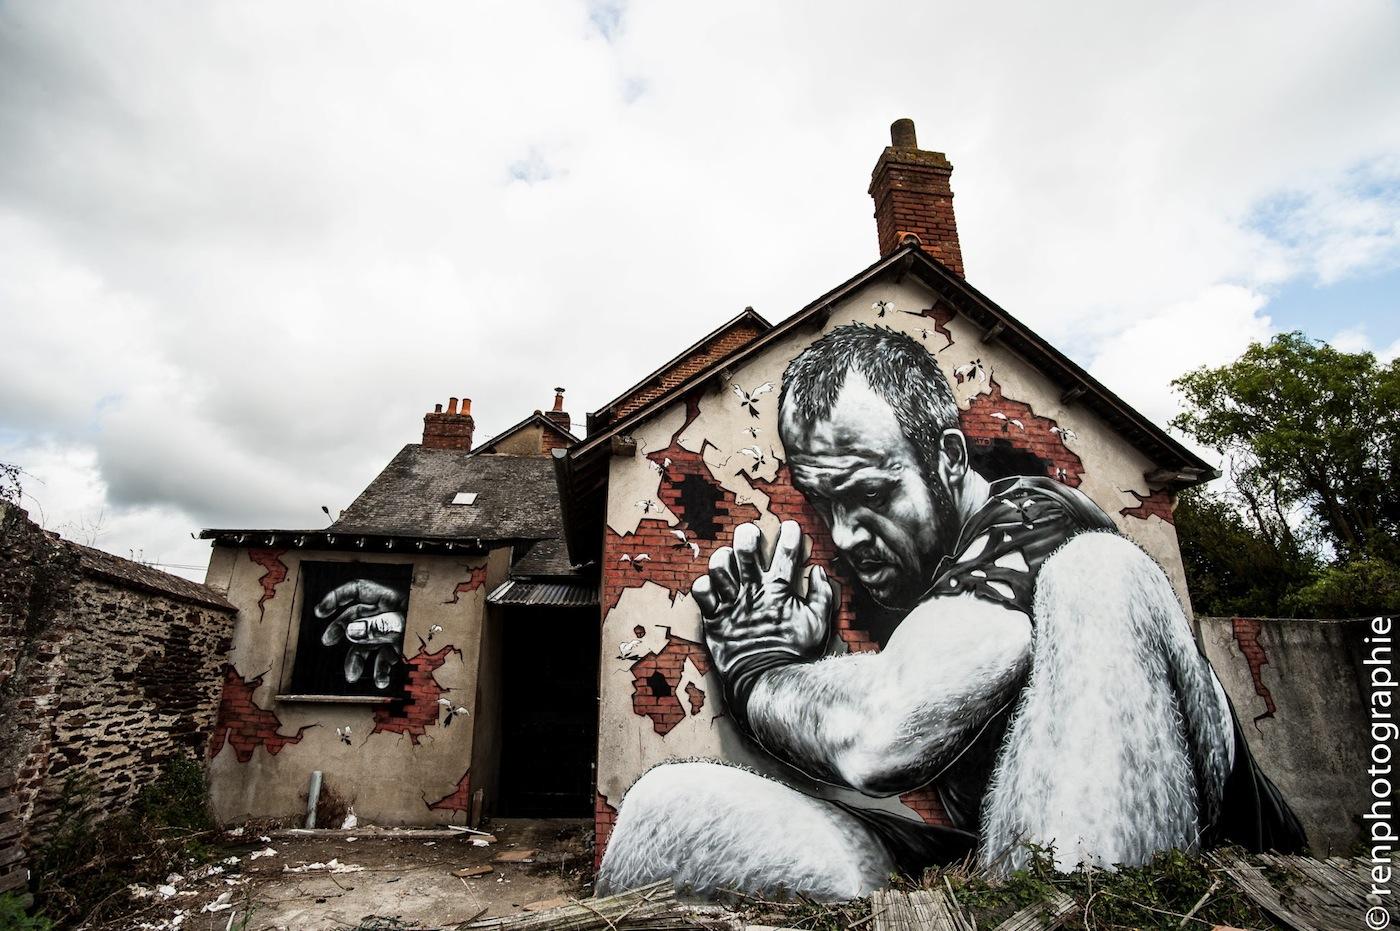 http://www.streetartutopia.com/wp-content/uploads/2012/09/3D-Street-Art-in-Rennes-France.jpg